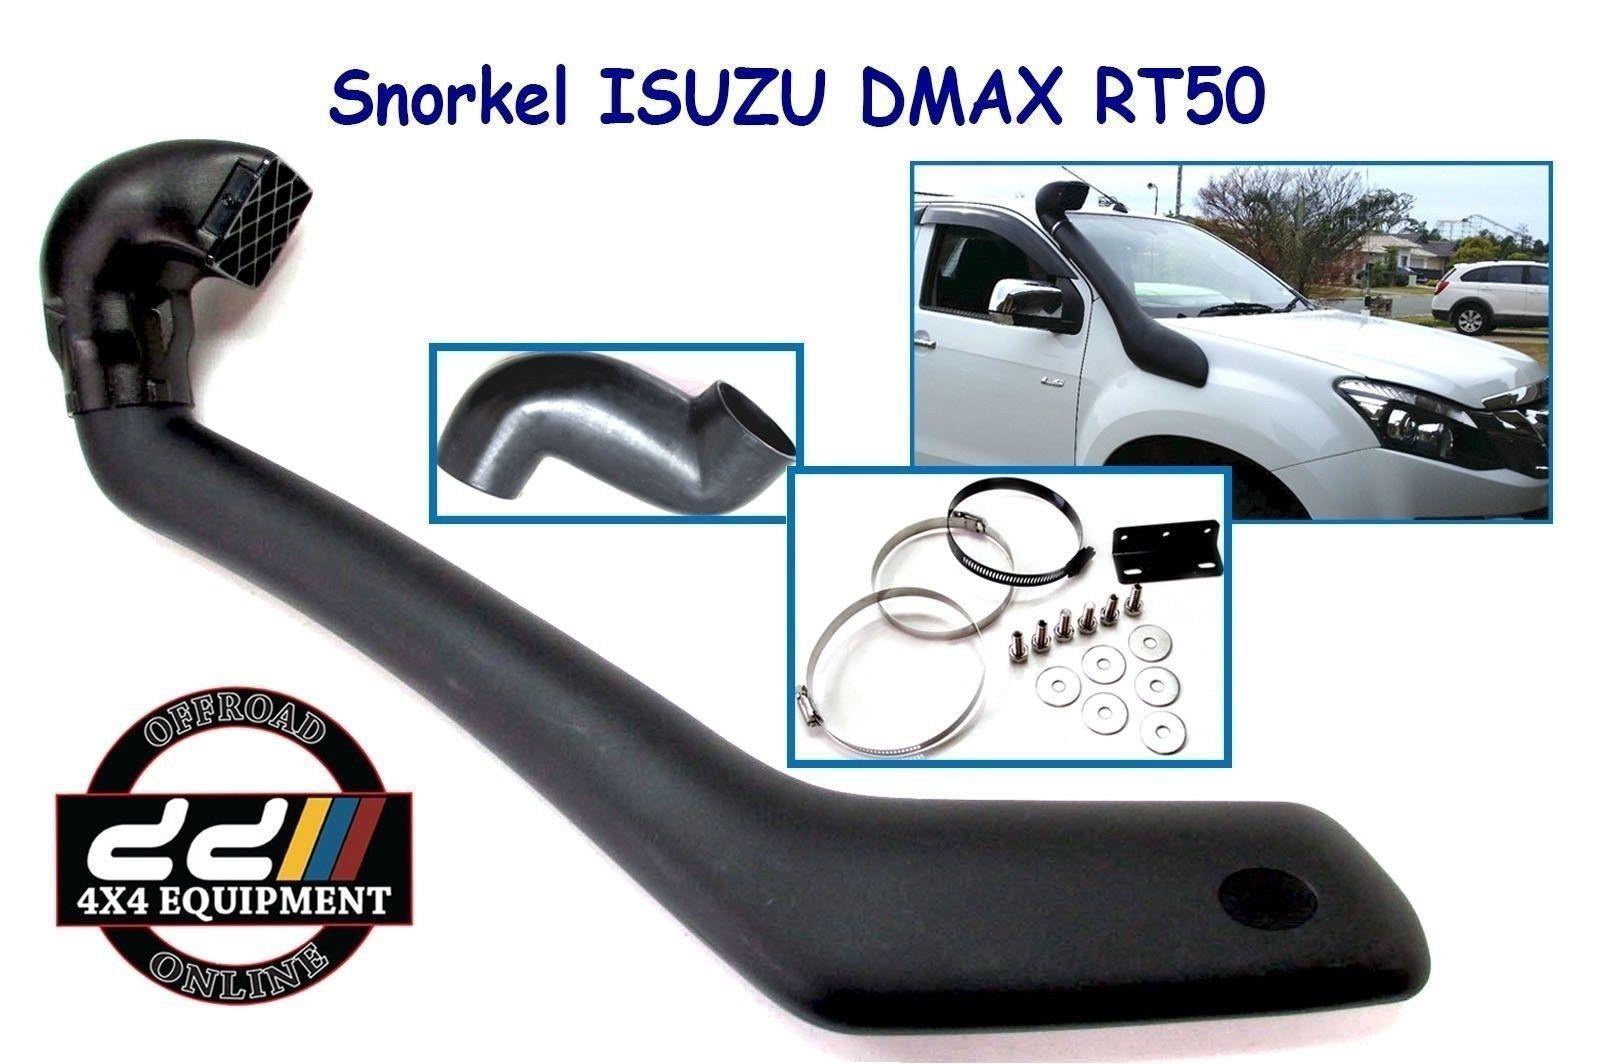 USエア インテーク シュノーケル いすゞD-Max用スノーケルエアインテークキットDMax RT50 2012オンデマンドディーゼルSS175H Snorkel Air Intake Kit For Isuzu D-Max DMax RT50 2012 Onward Diesel SS175H